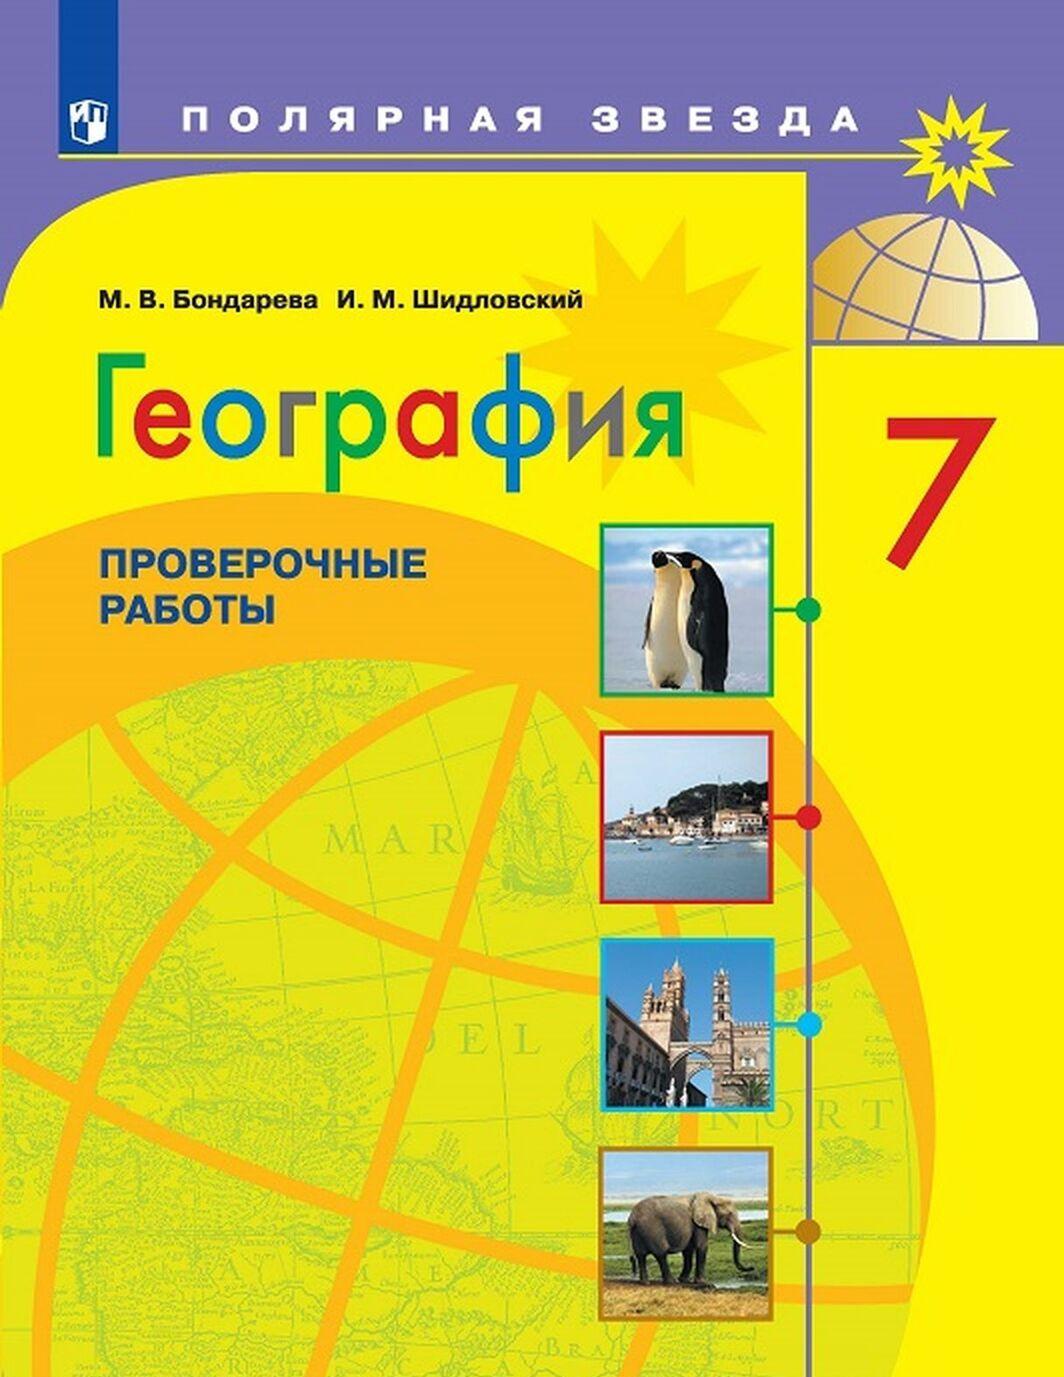 Geografija. 7 klass. Proverochnye raboty | Bondareva Marija Vladimirovna, Shidlovskij Igor Mikhajlovich